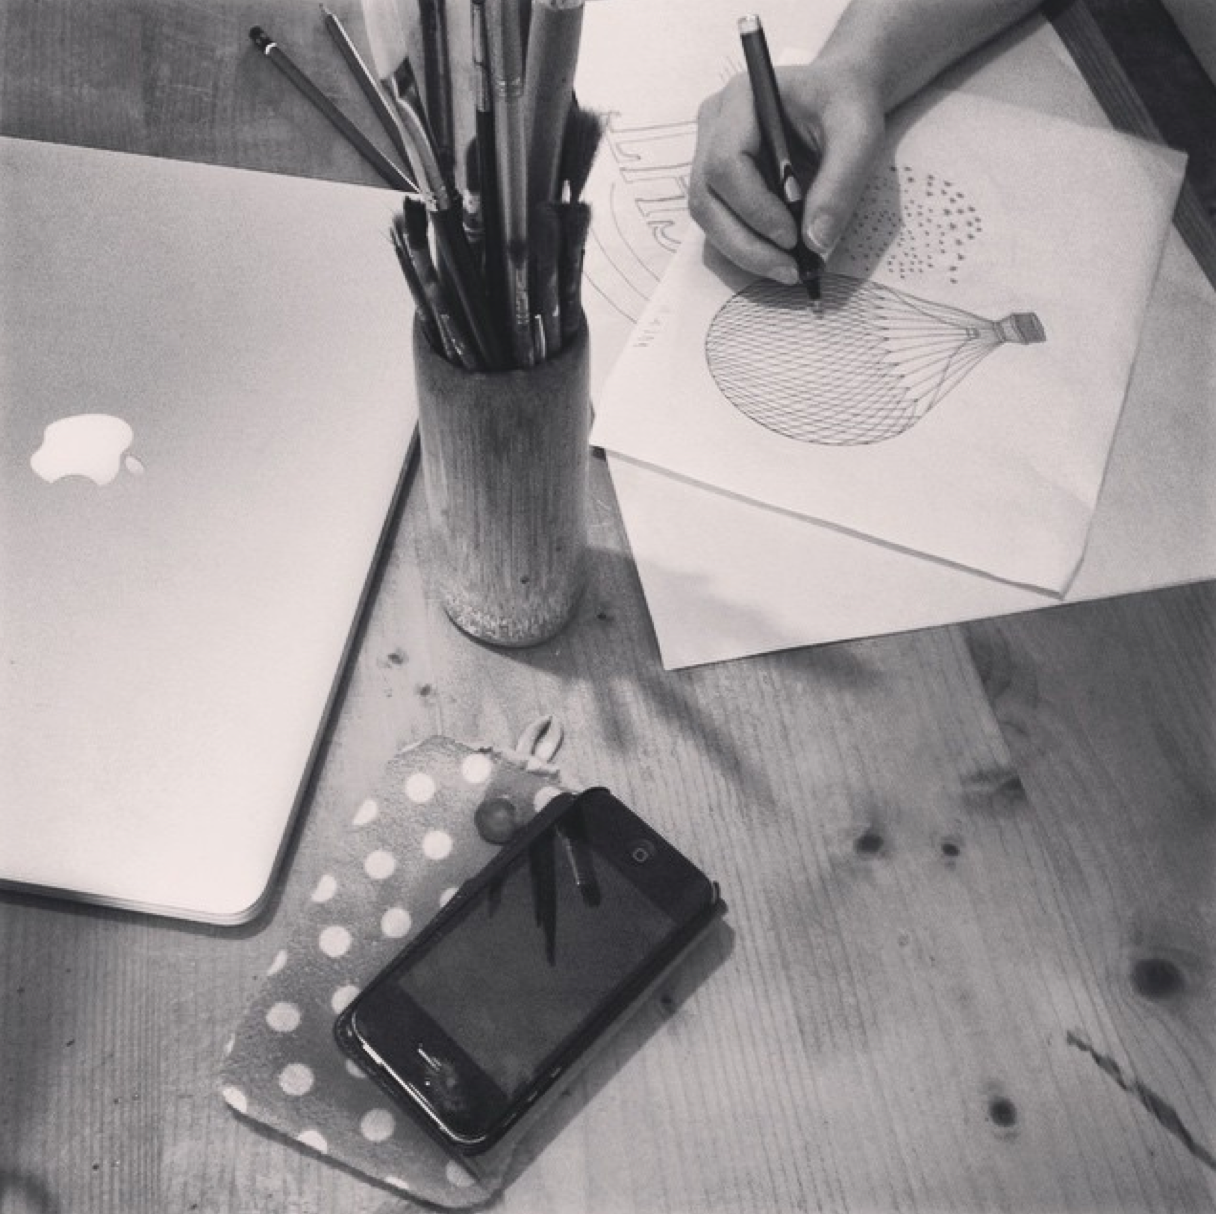 Working on latest illustration project at poppi design